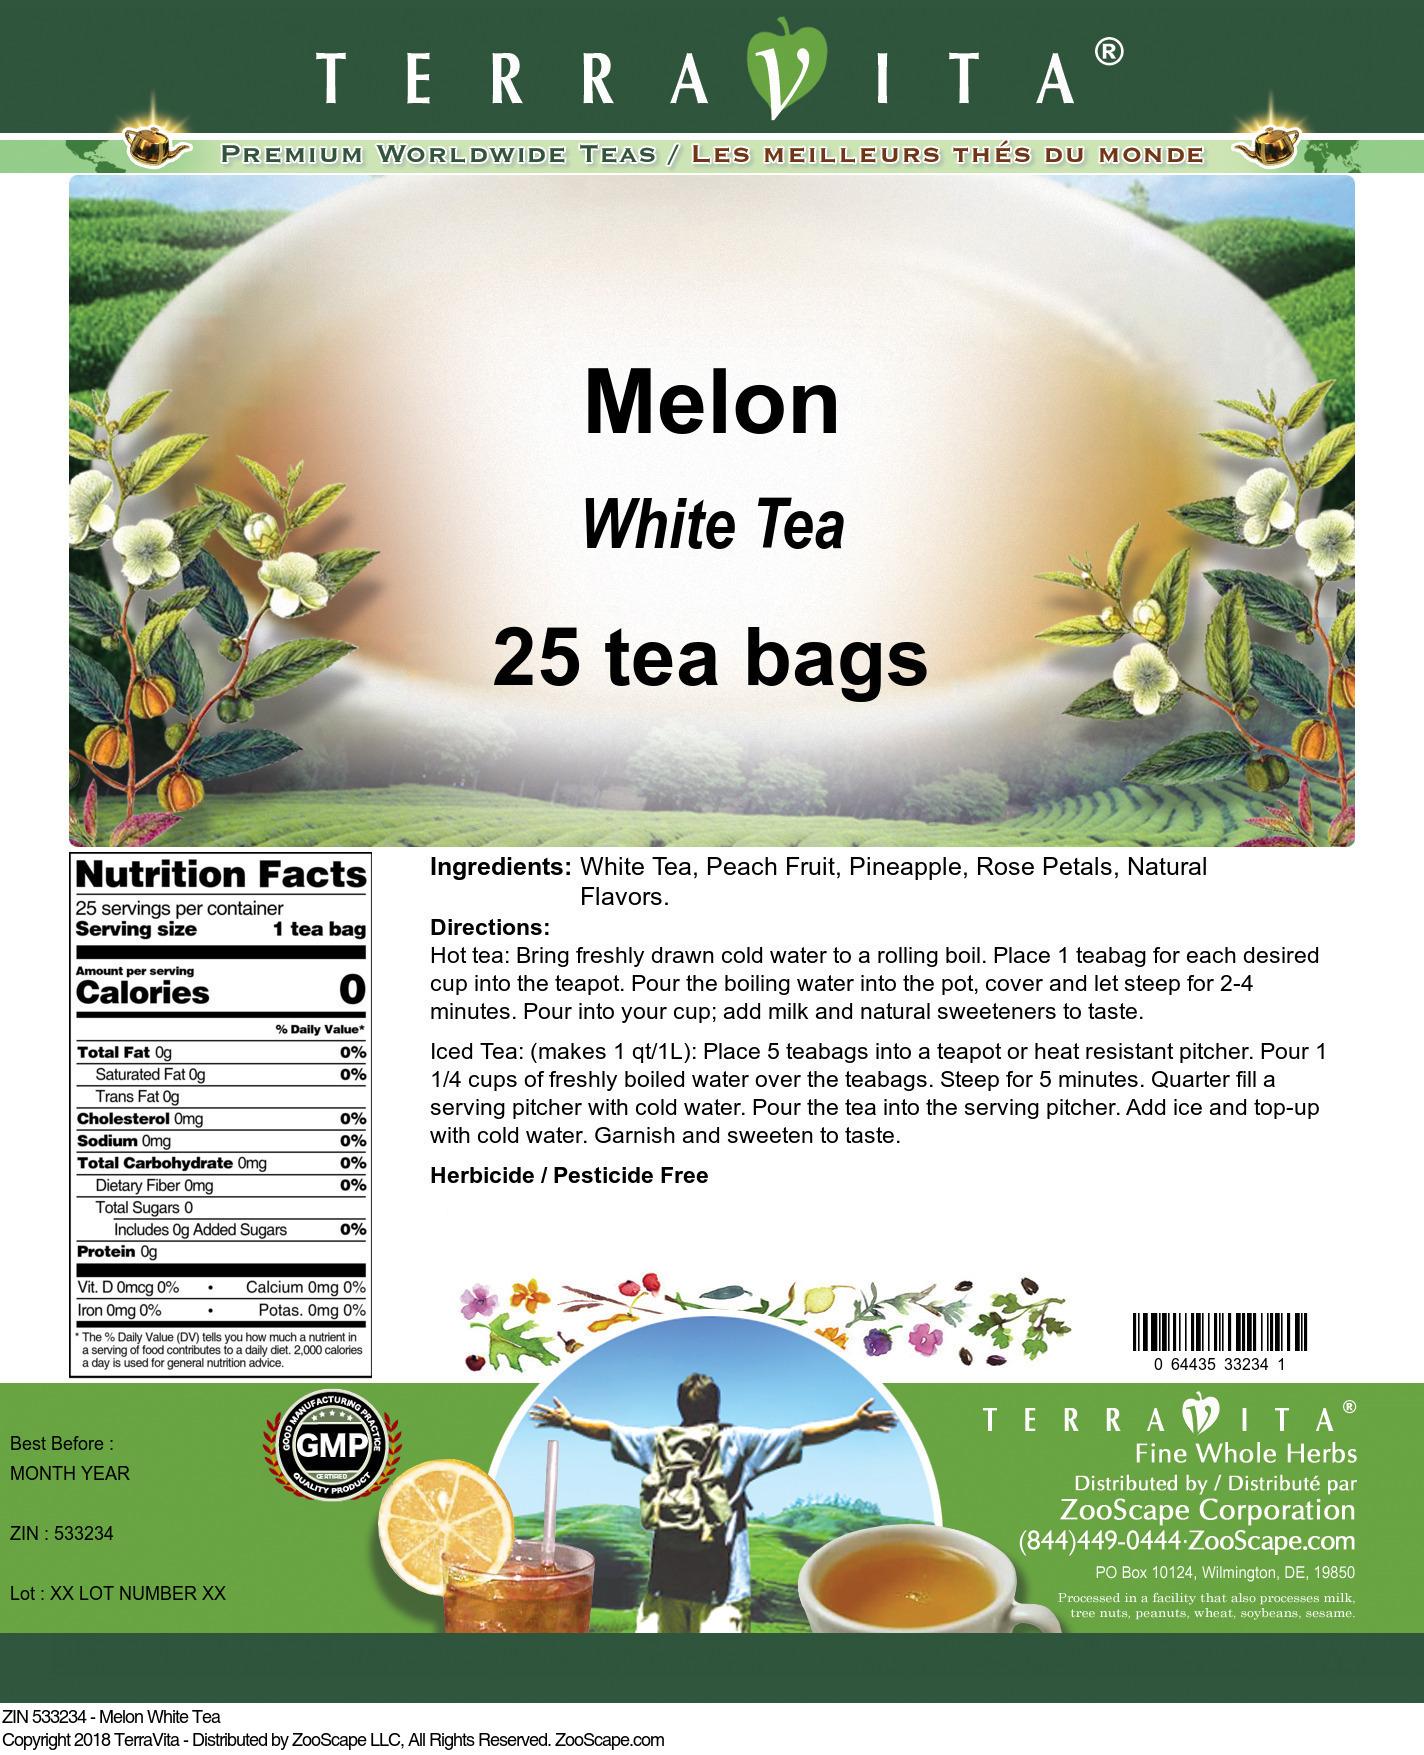 Melon White Tea